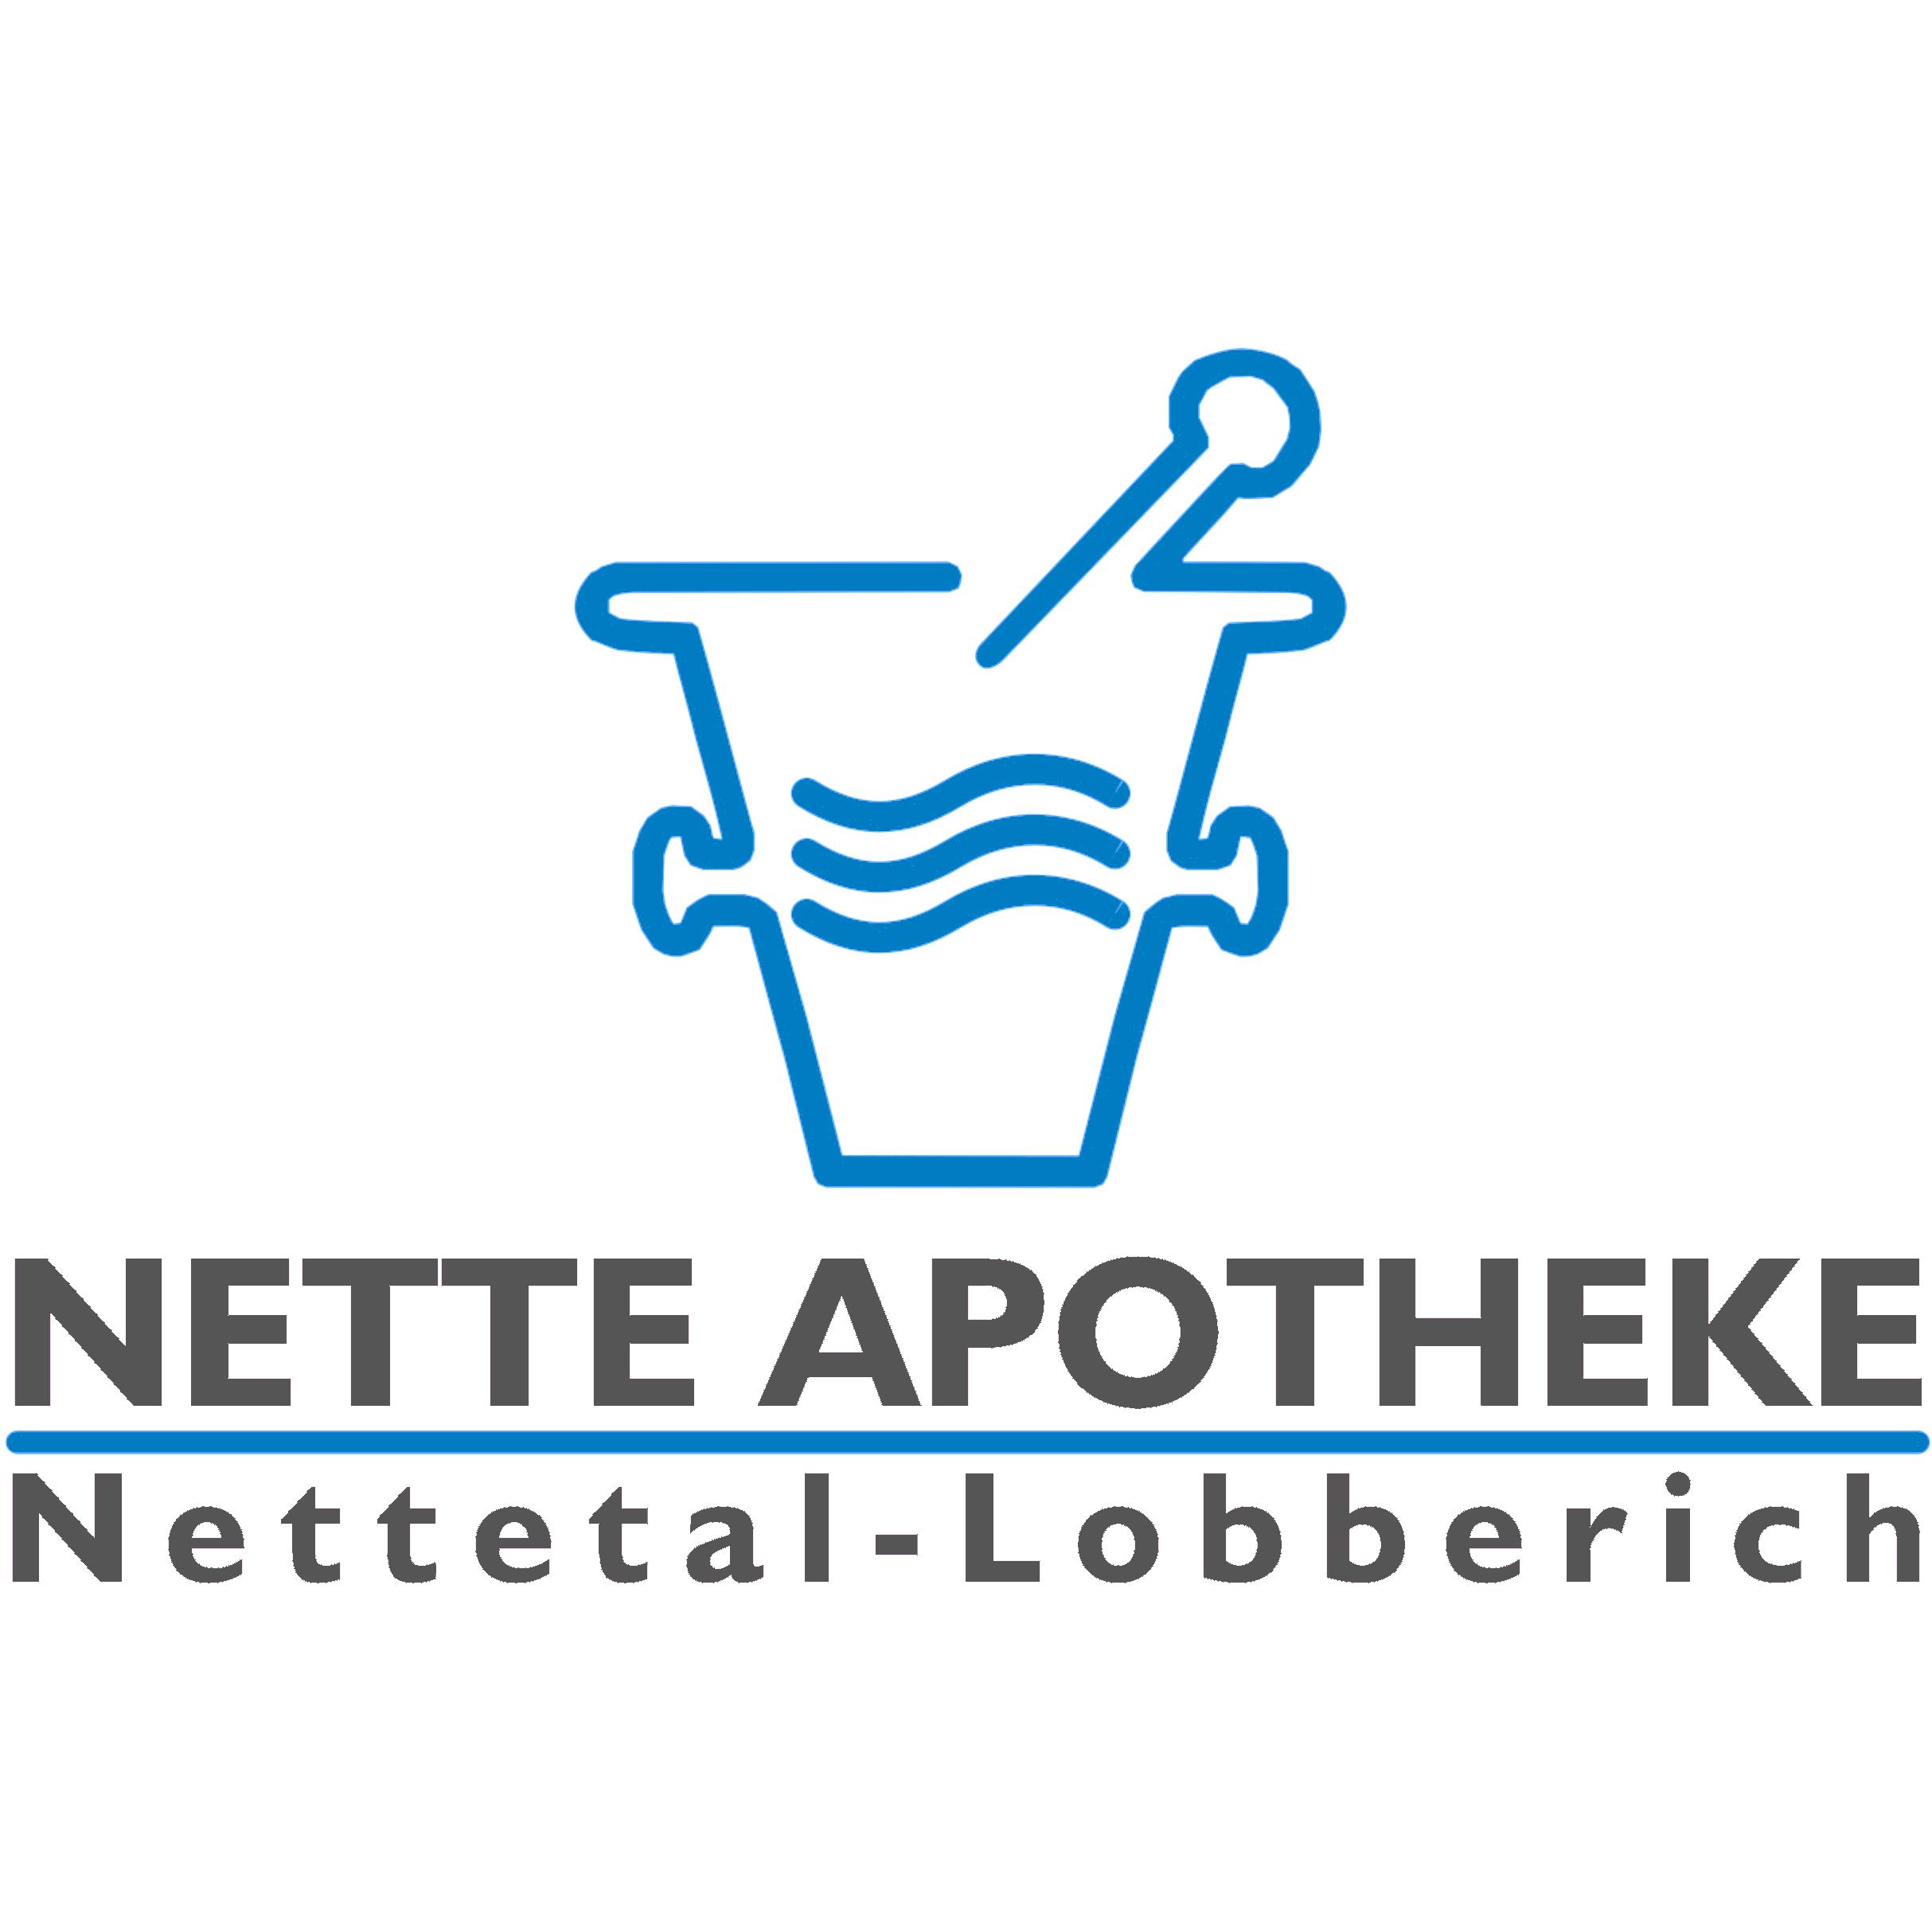 Bild zu NETTE APOTHEKE Arndt Schulte in Nettetal